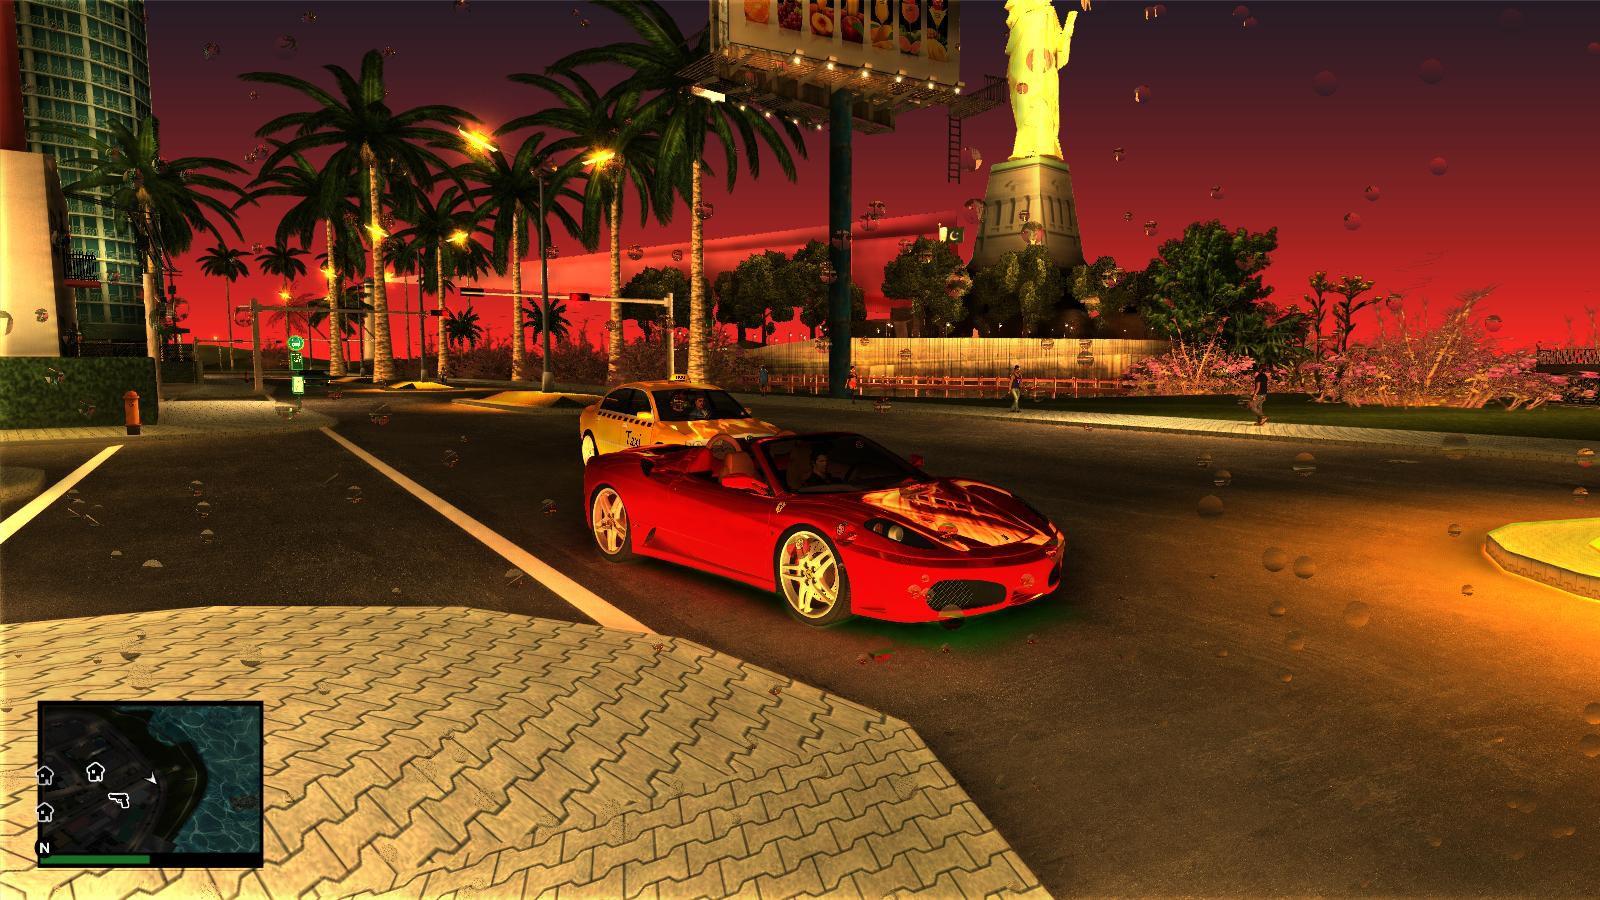 Grand Theft Auto: Vice City: Modern Vice City